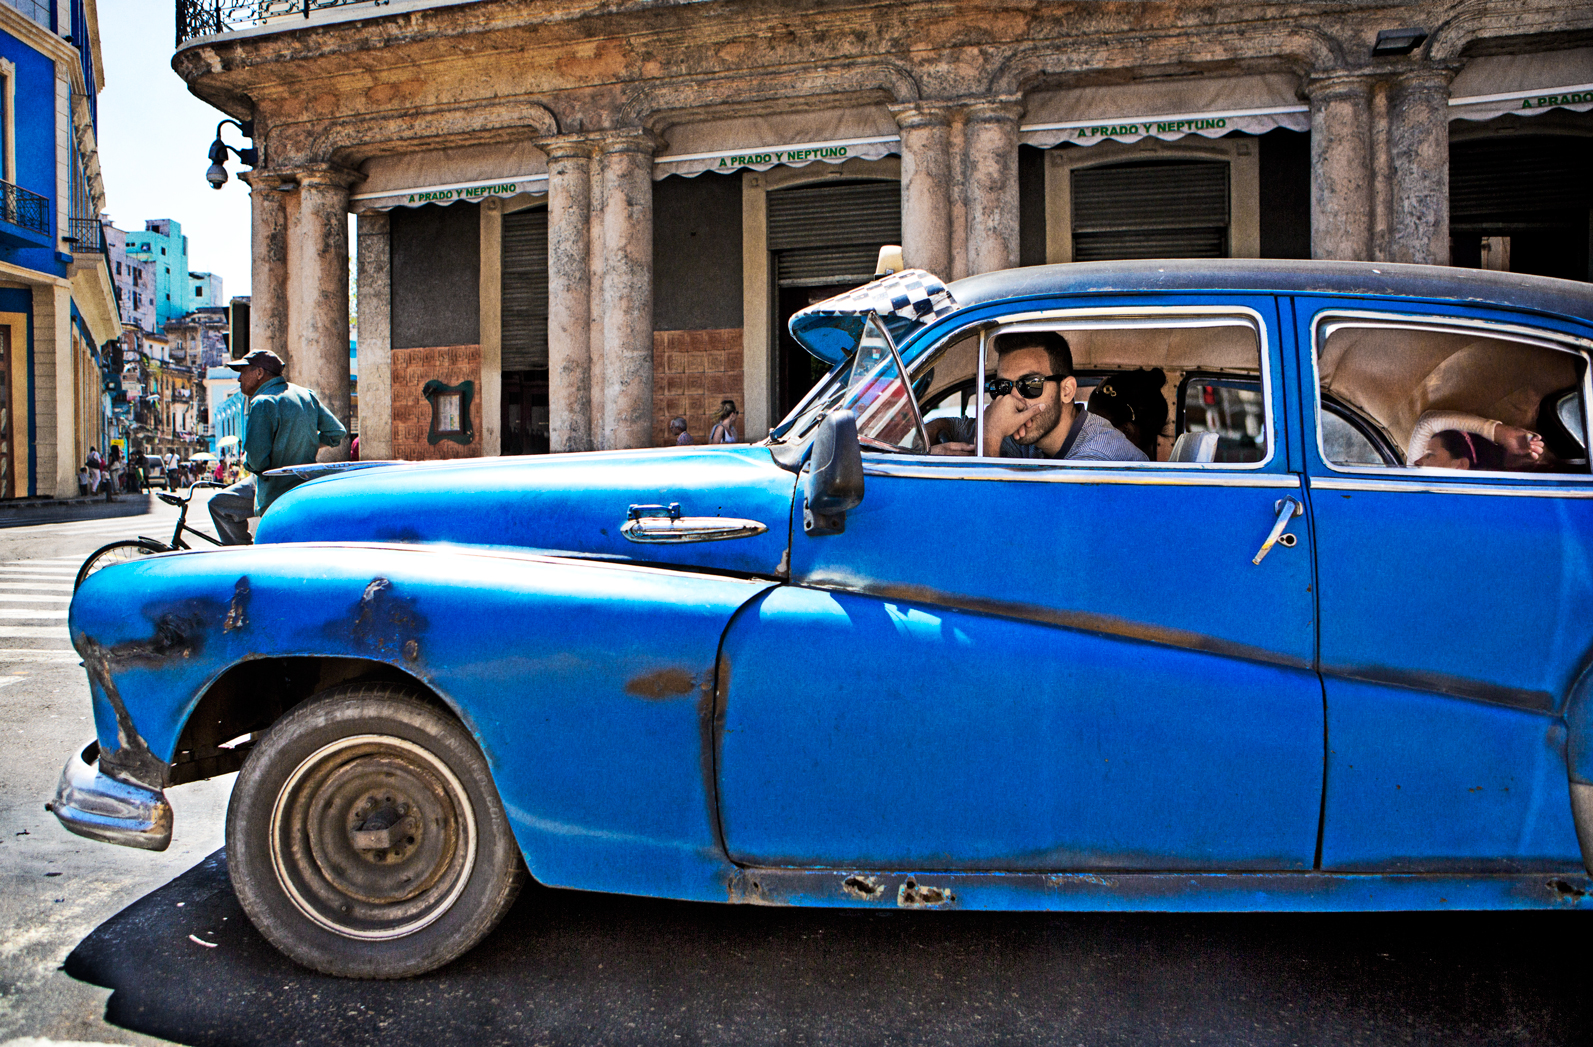 Taxi_Cuba_47B9417_CANVAS_FINAL.jpg